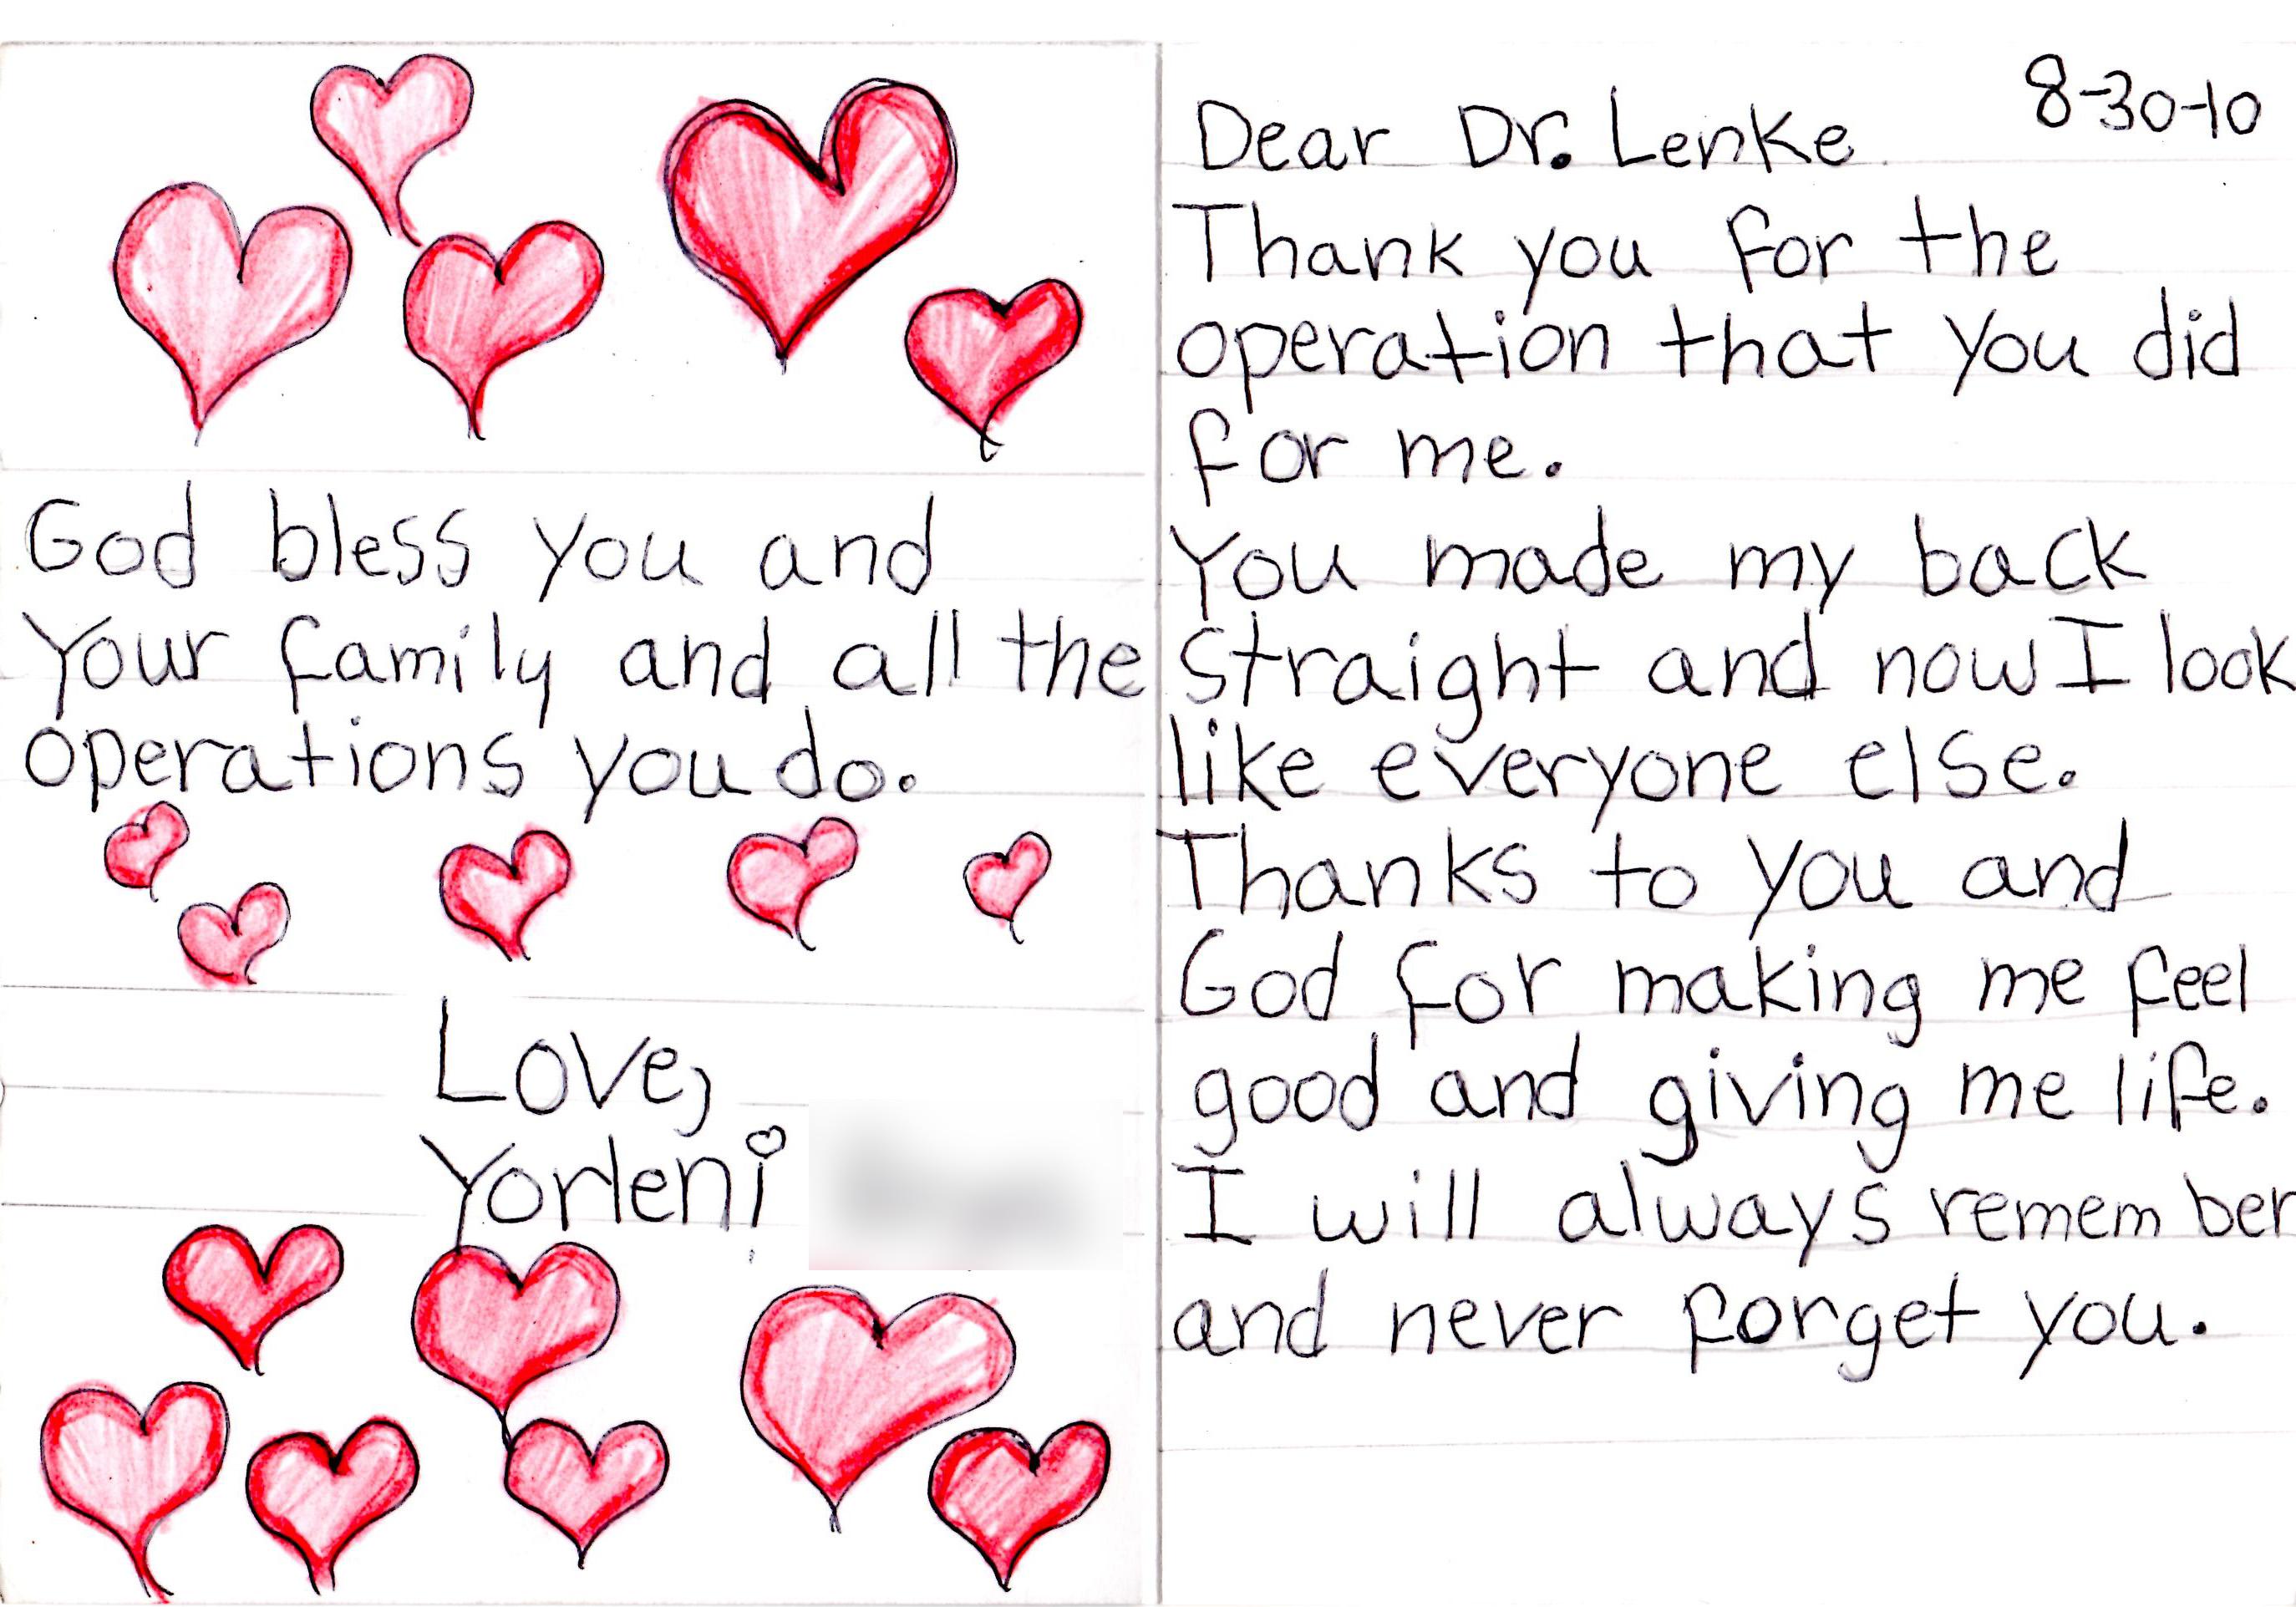 Expressions Of Gratitude Lawrence G Lenke MD